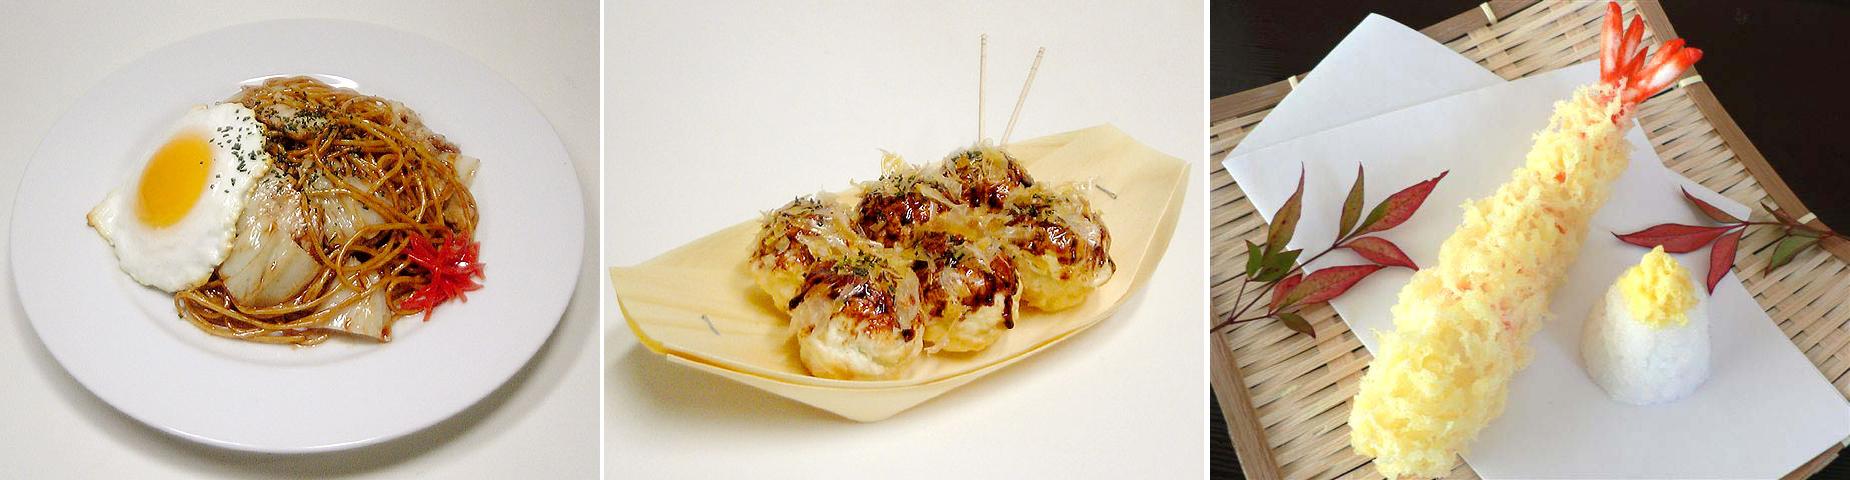 Yakisoba-takoyaki y una tempura de gamba - (www.fake-food.net)